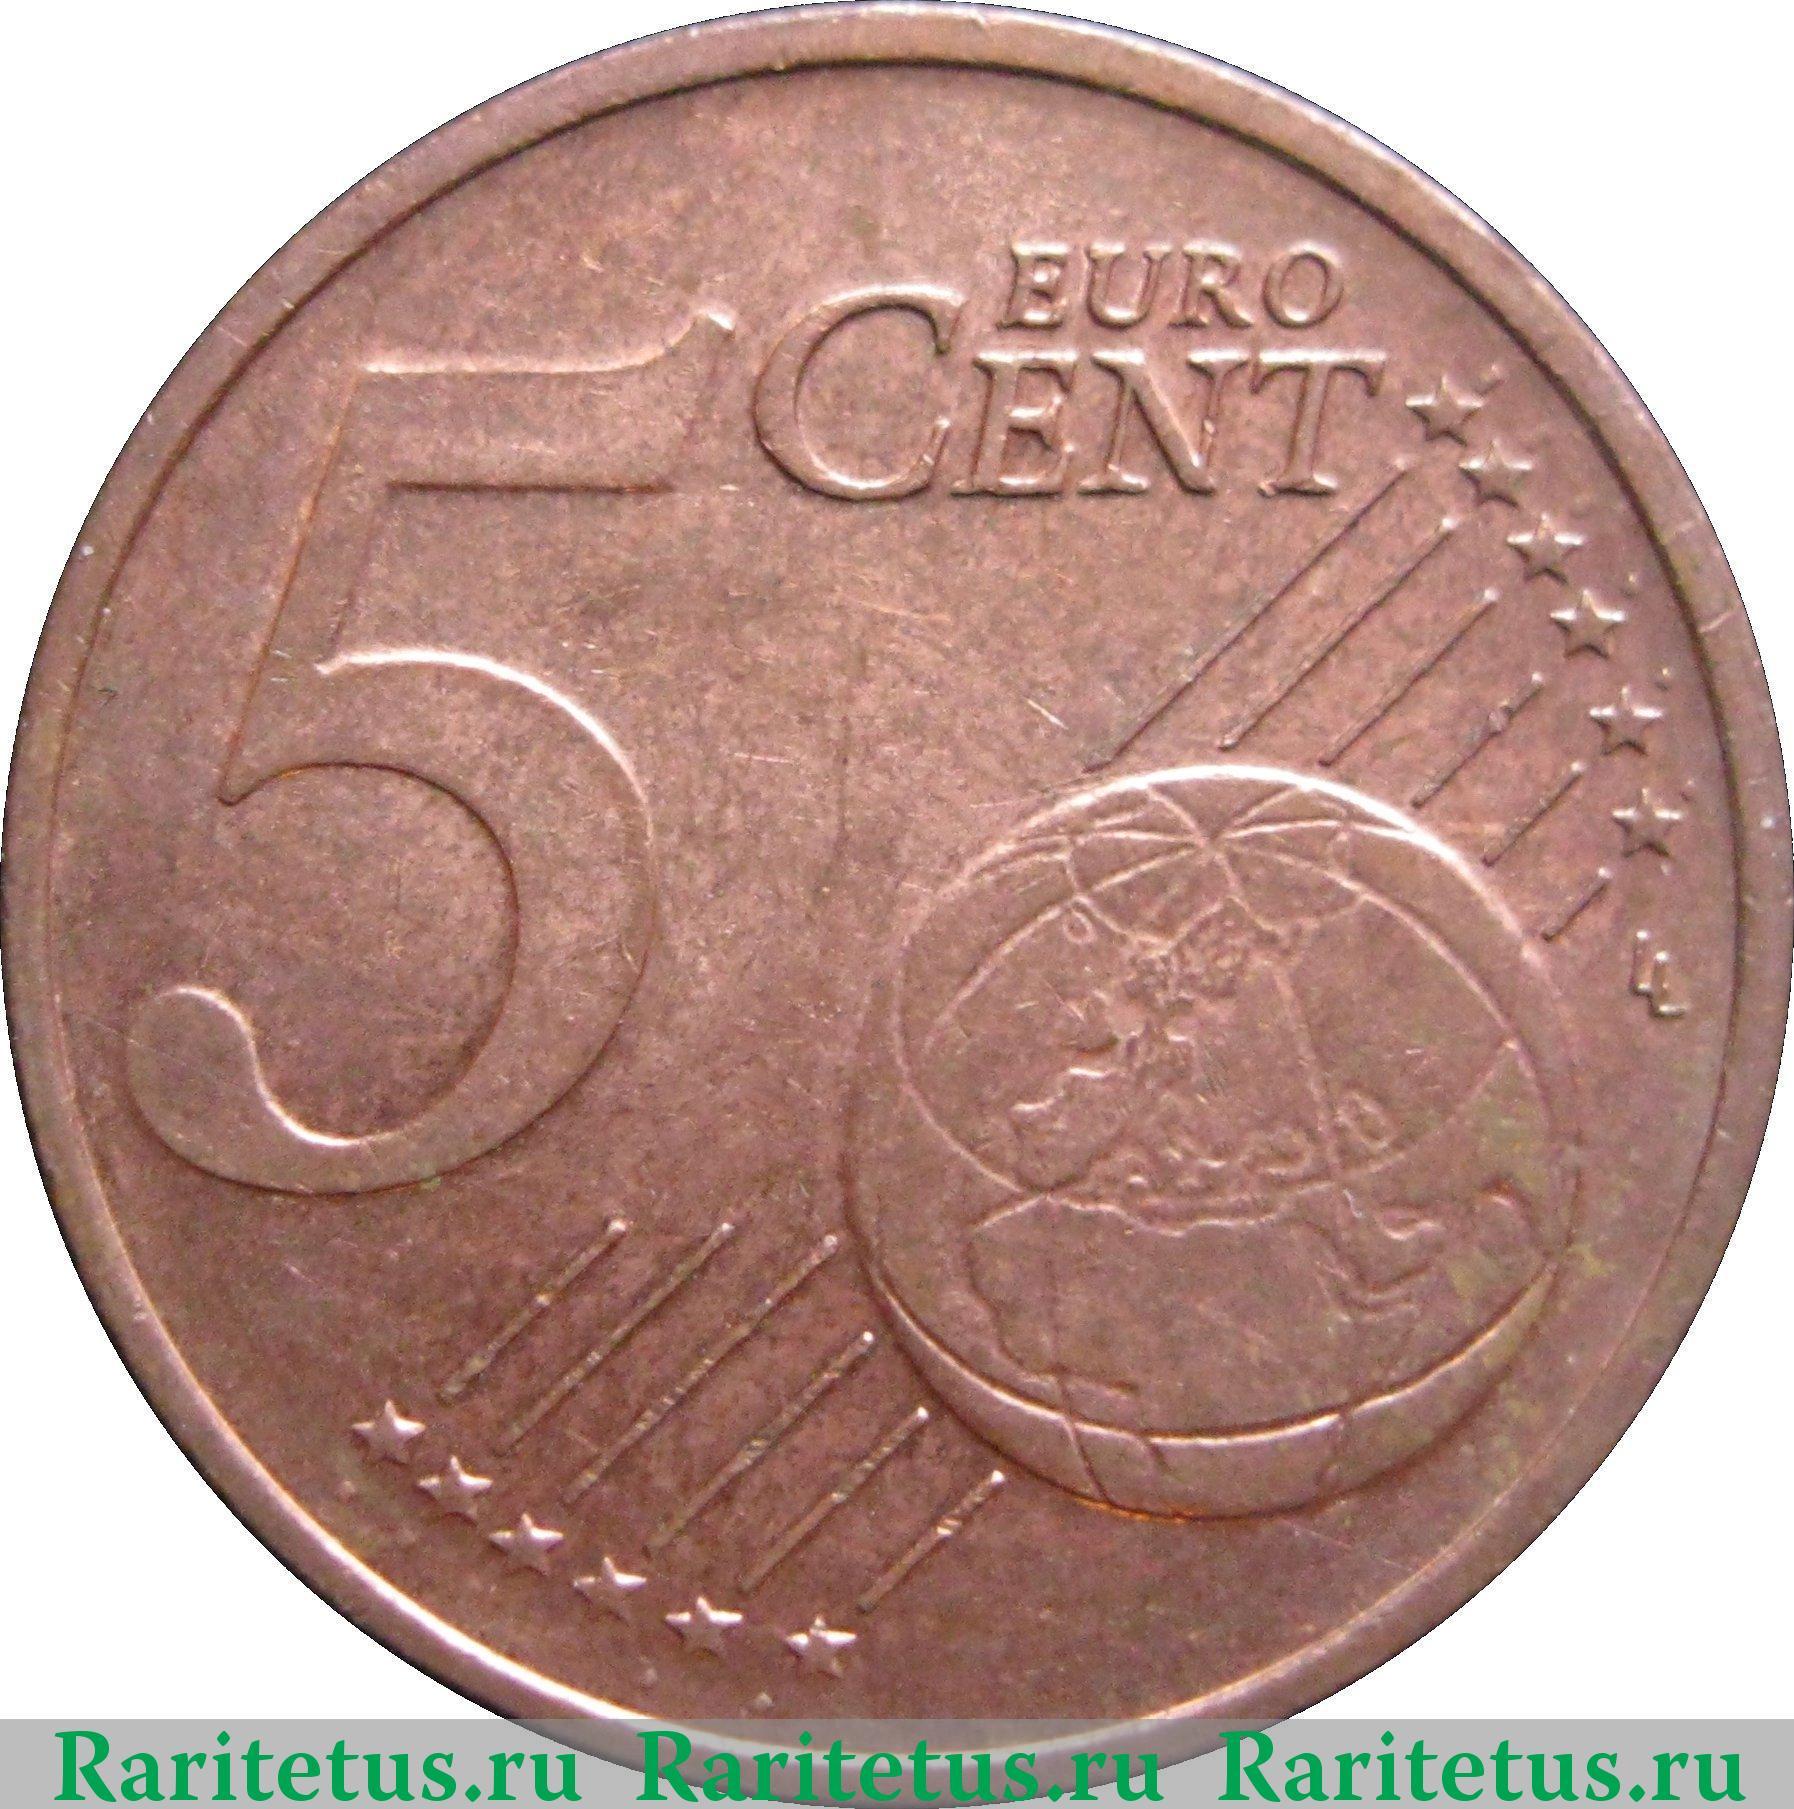 20 евро монета в рублях 10 рублей приозерск 2008 цена